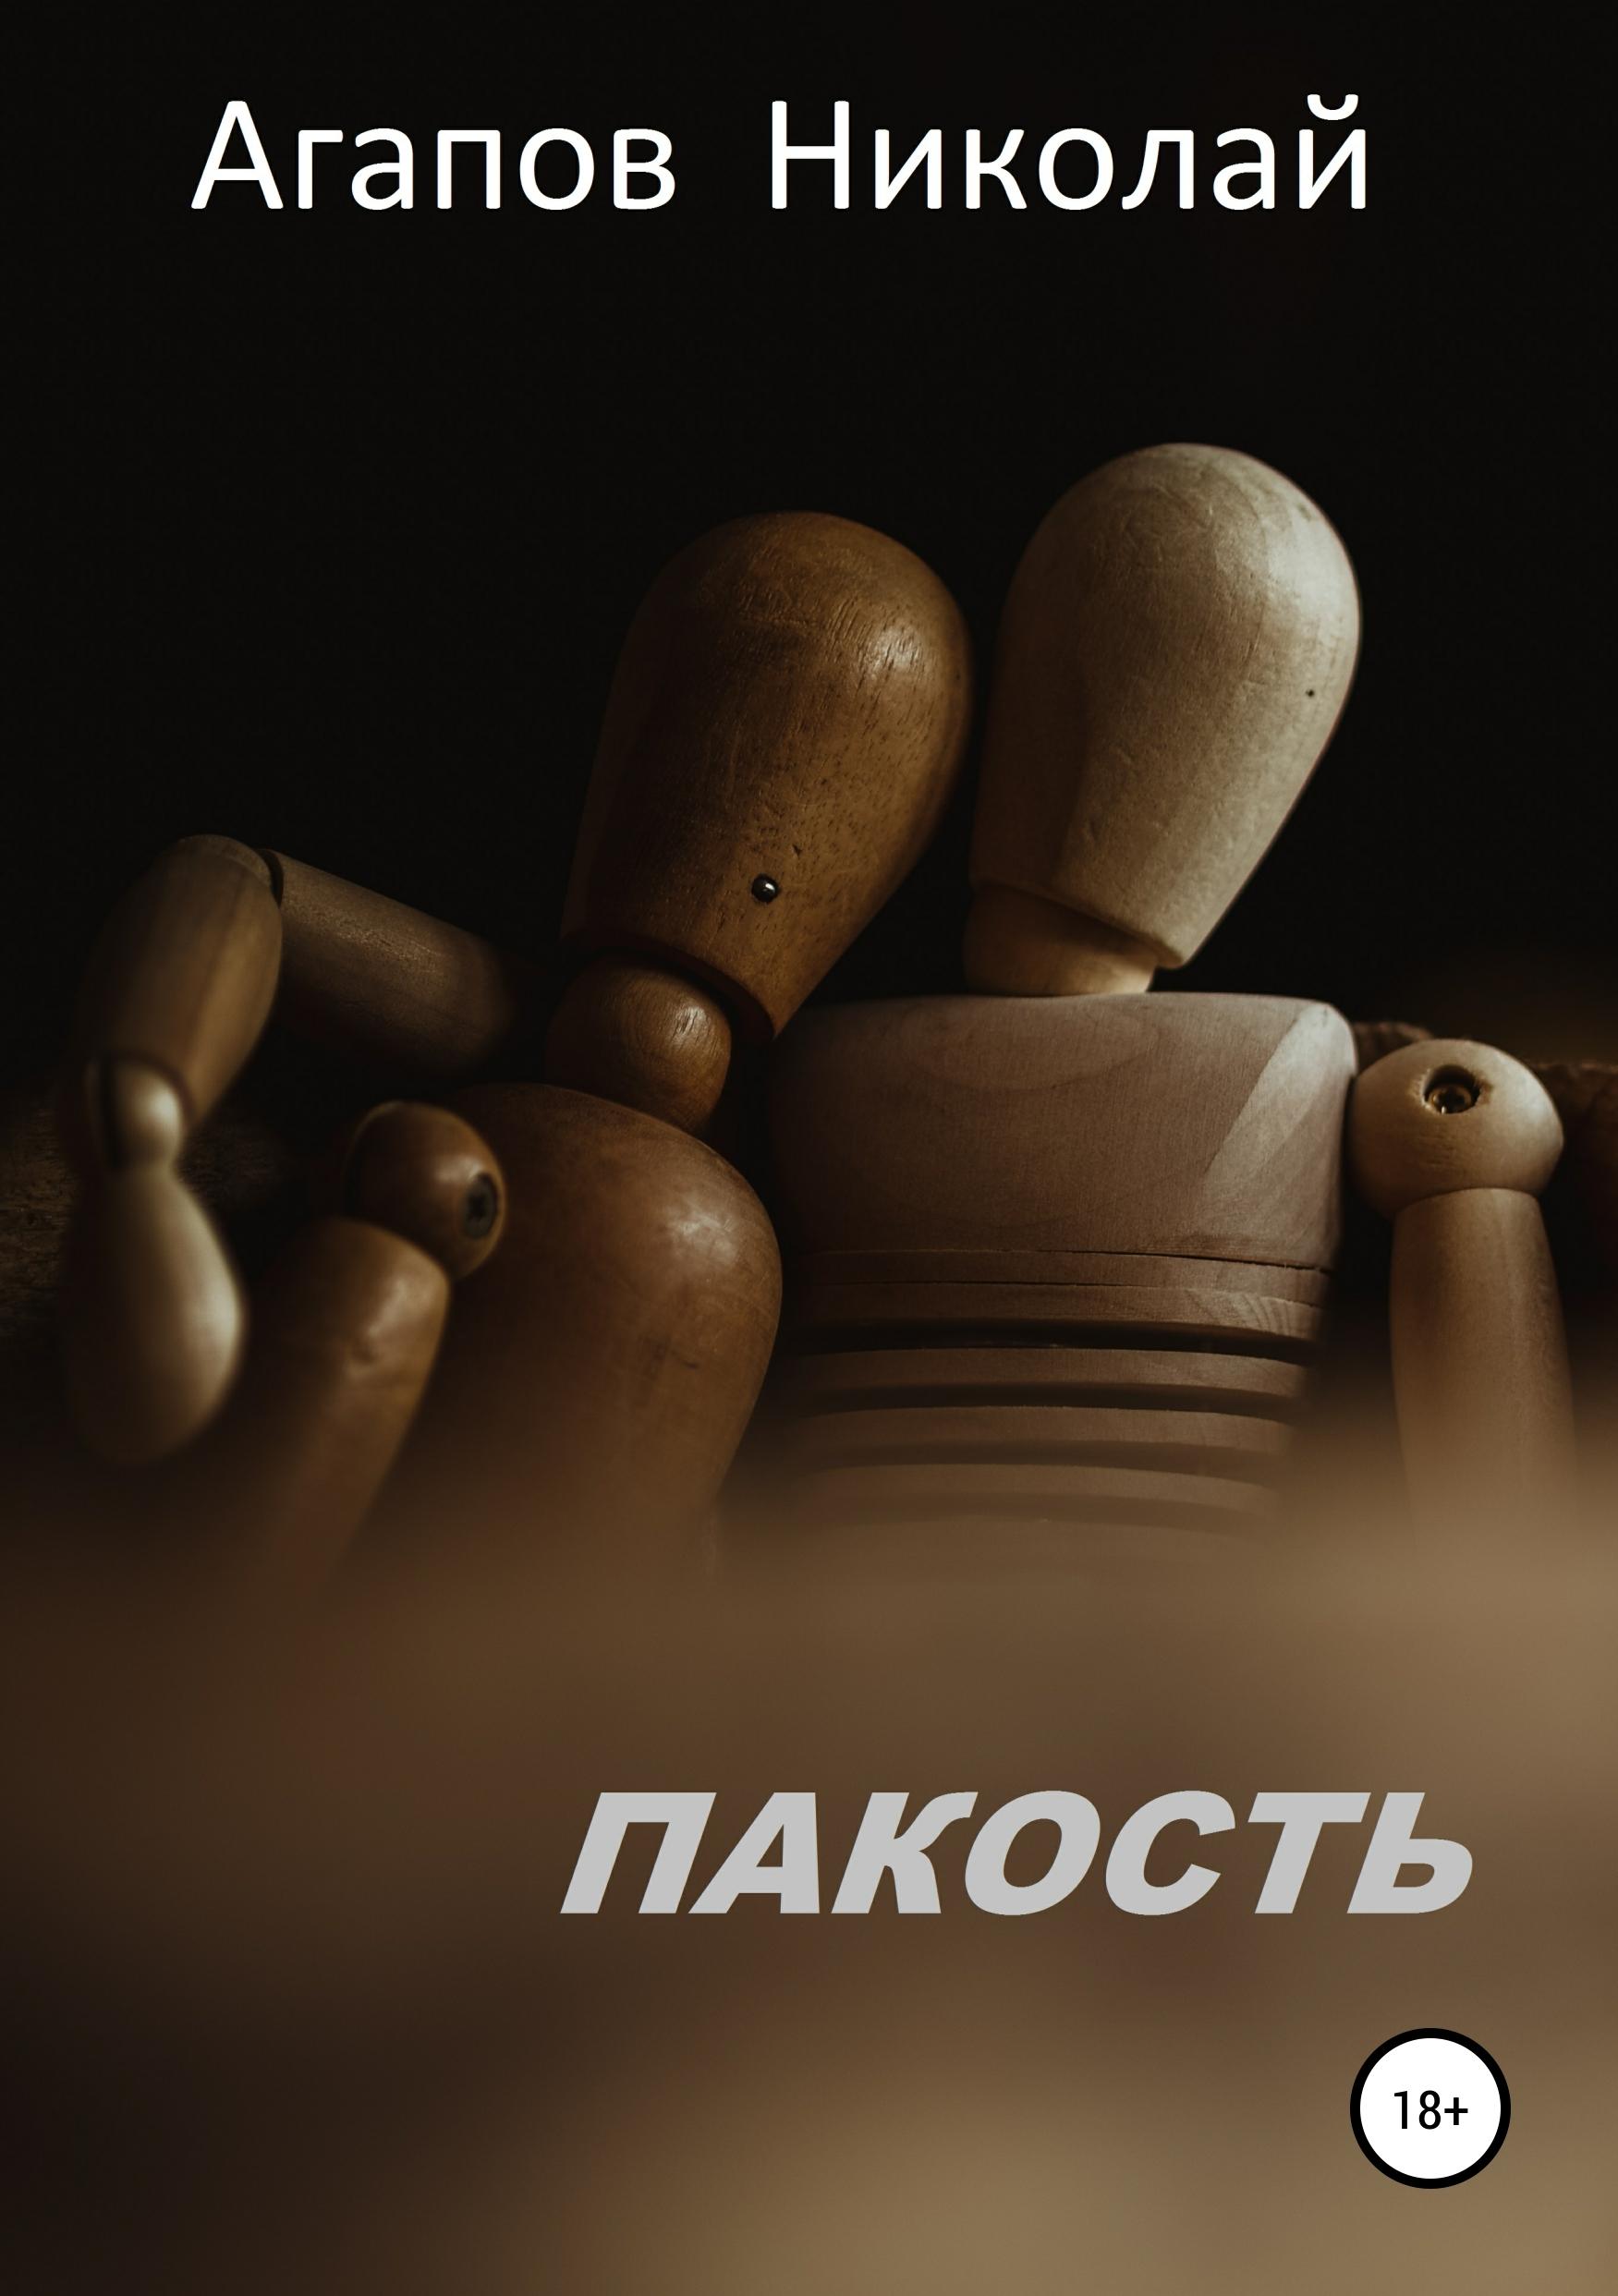 Николай Агапов Пакость